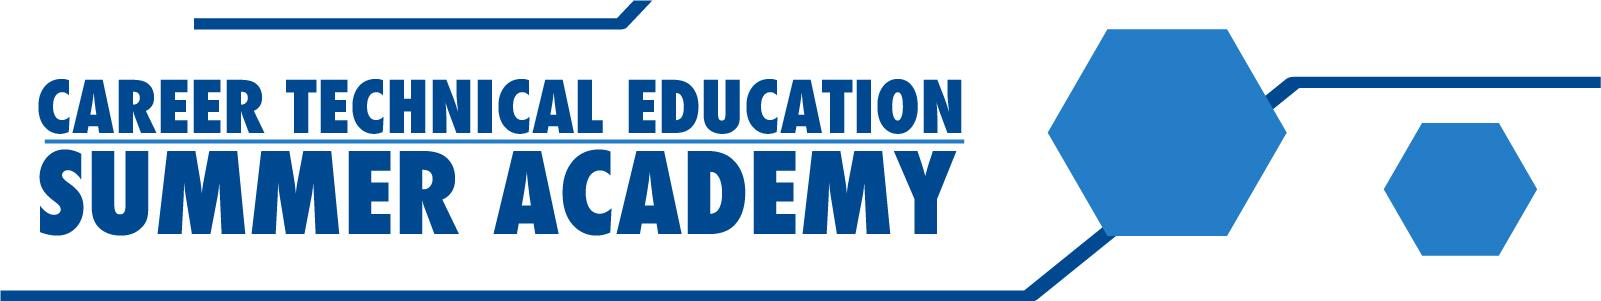 CTE Summer Academy